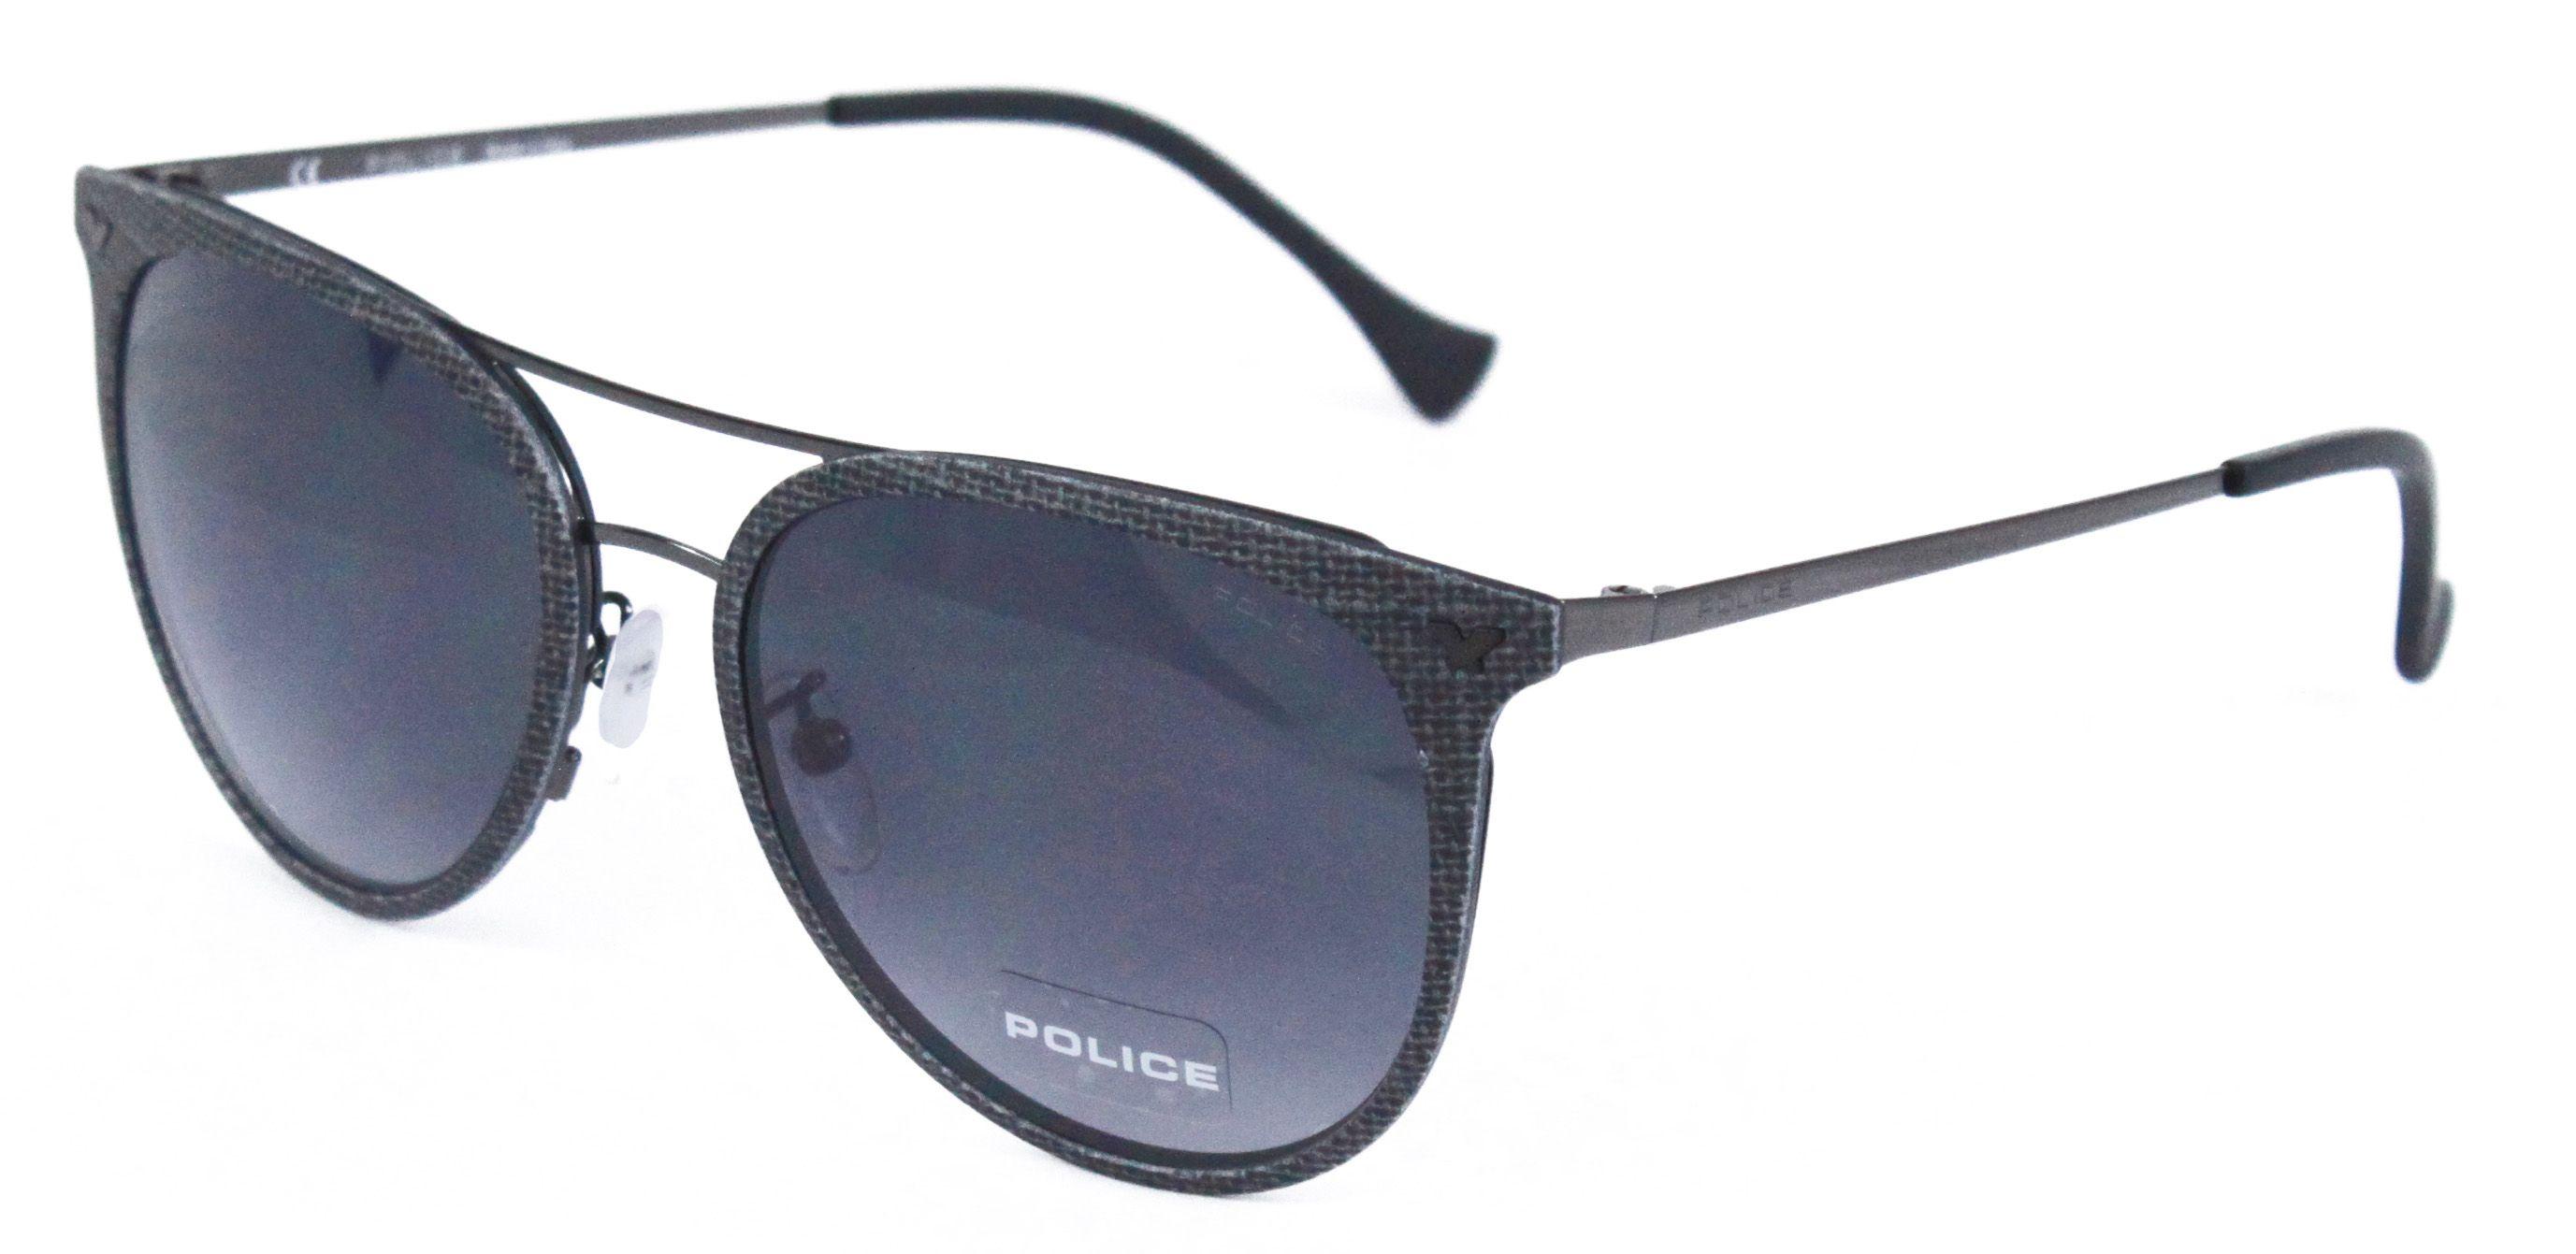 Police SPL153 AG5X Sunglasses